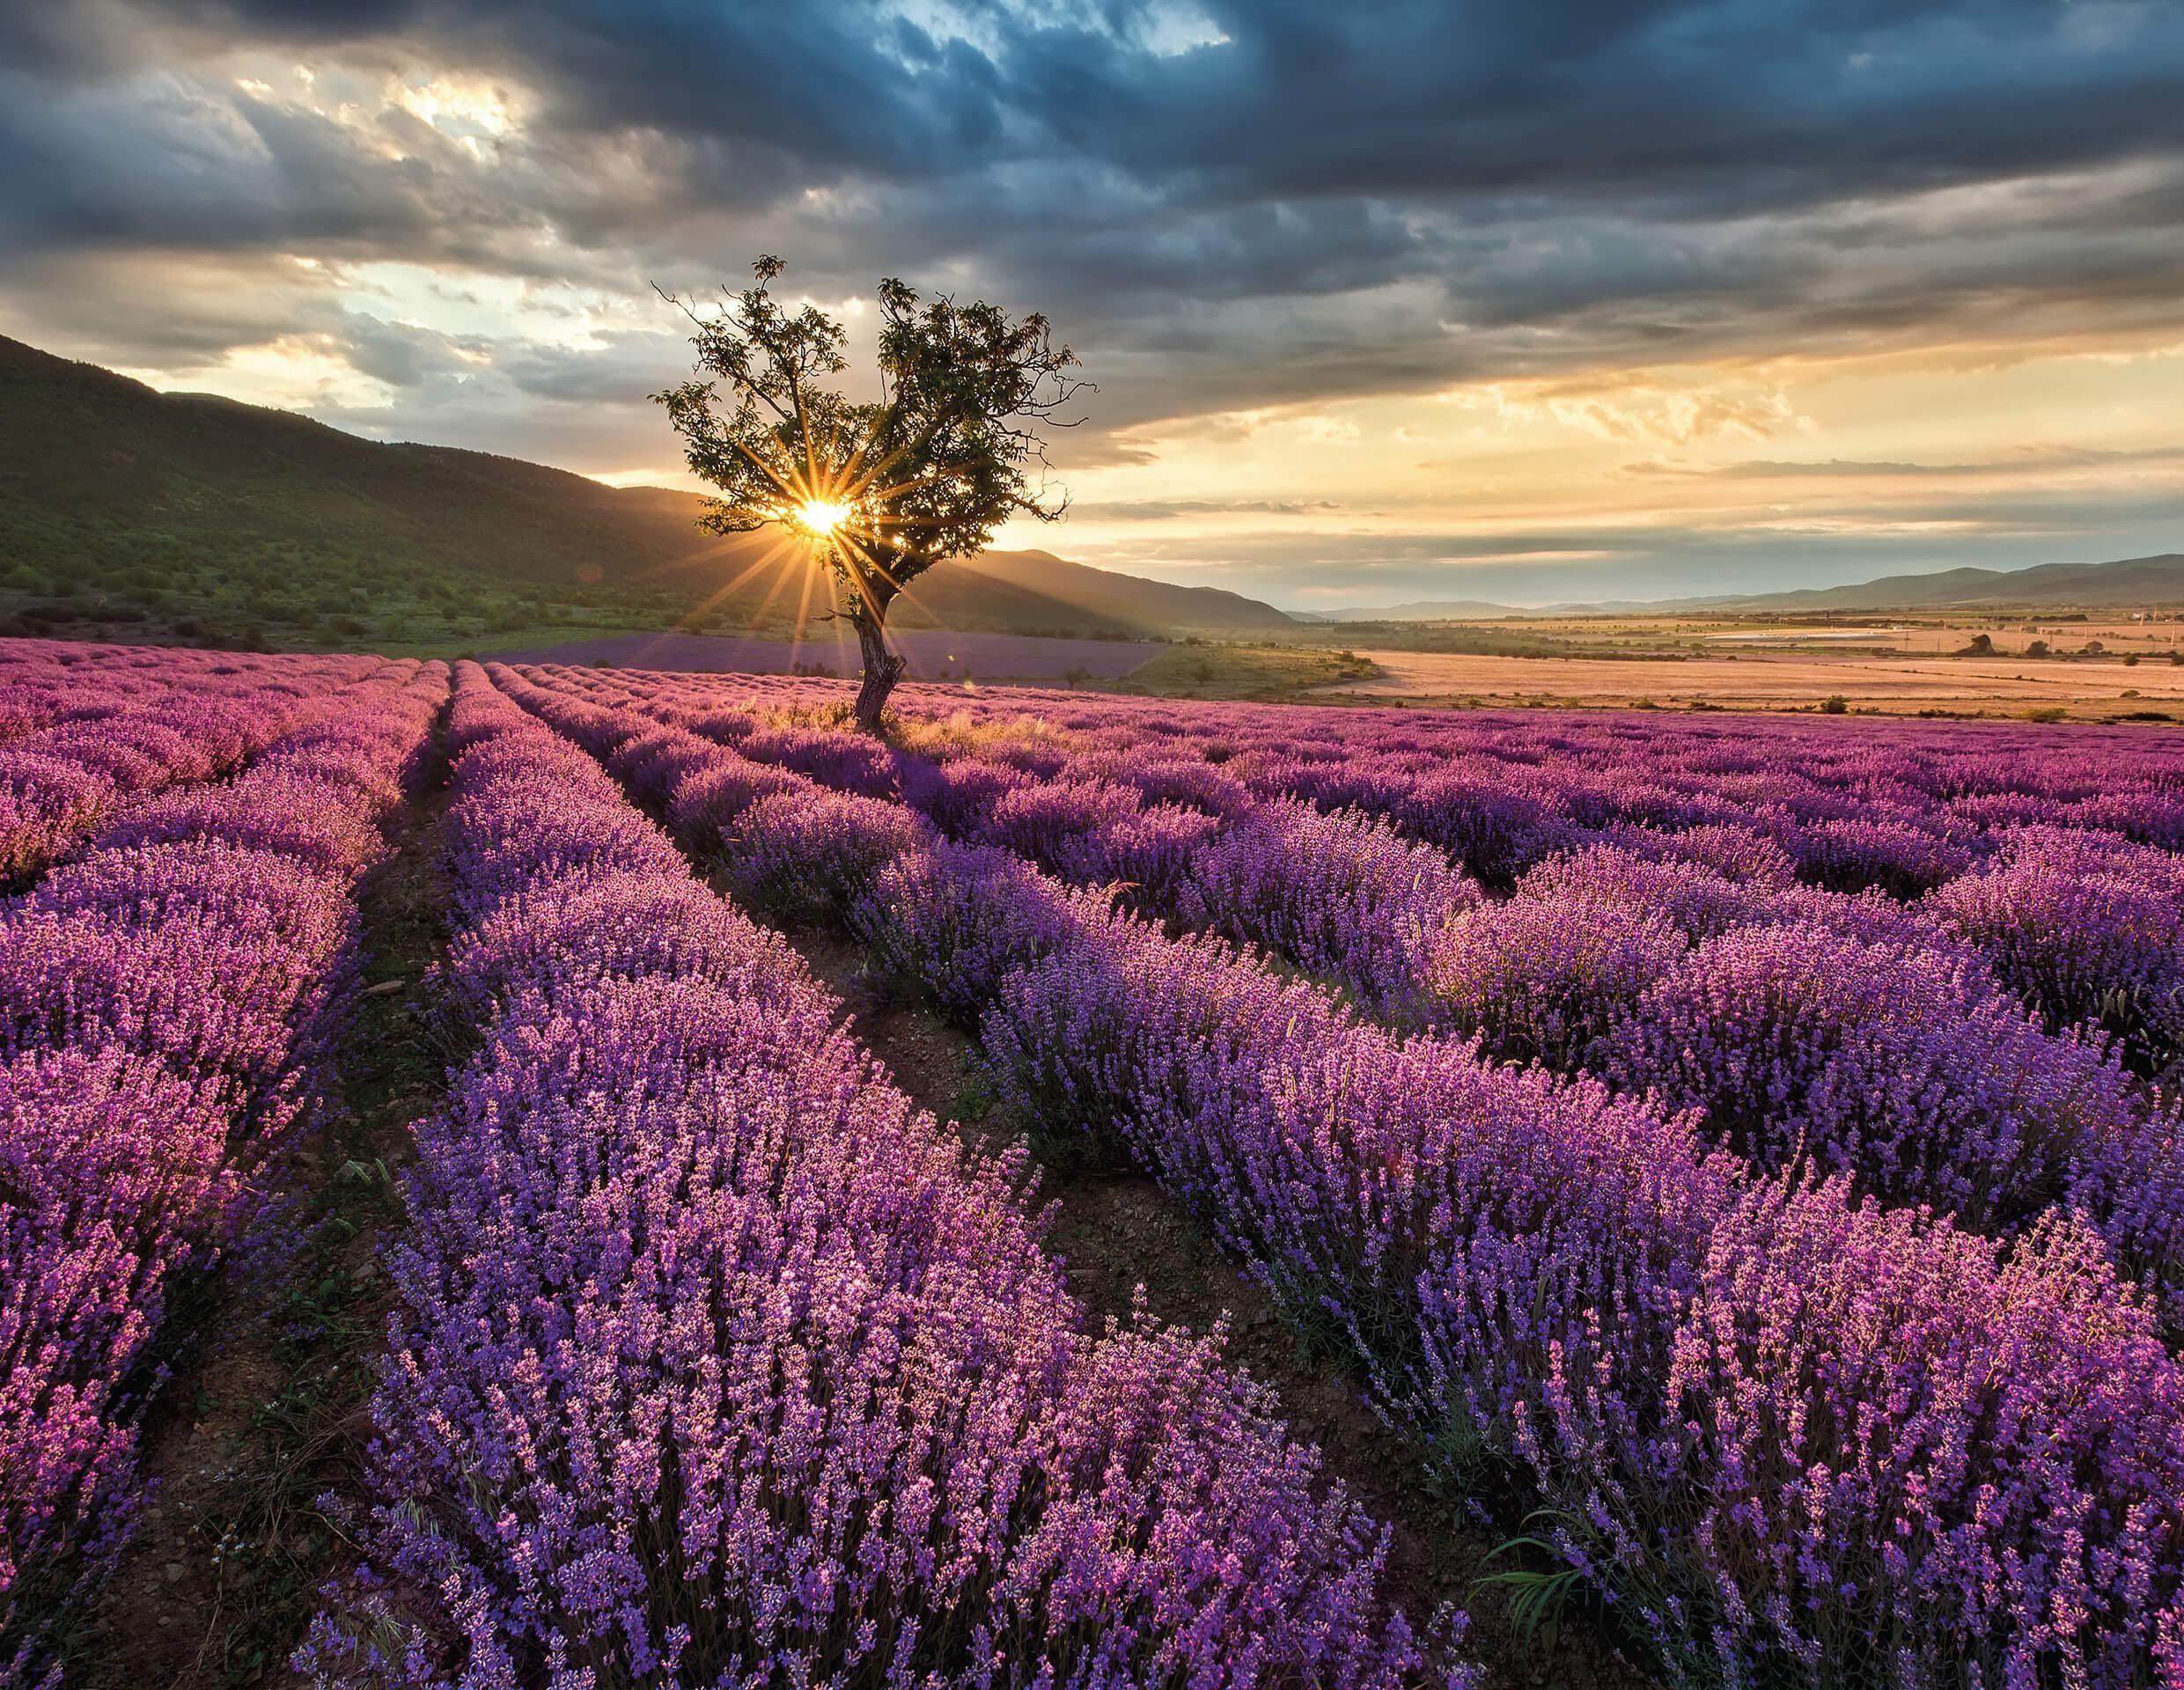 Fototapete, living walls, »Lavendelfeld«, Vlies glatt